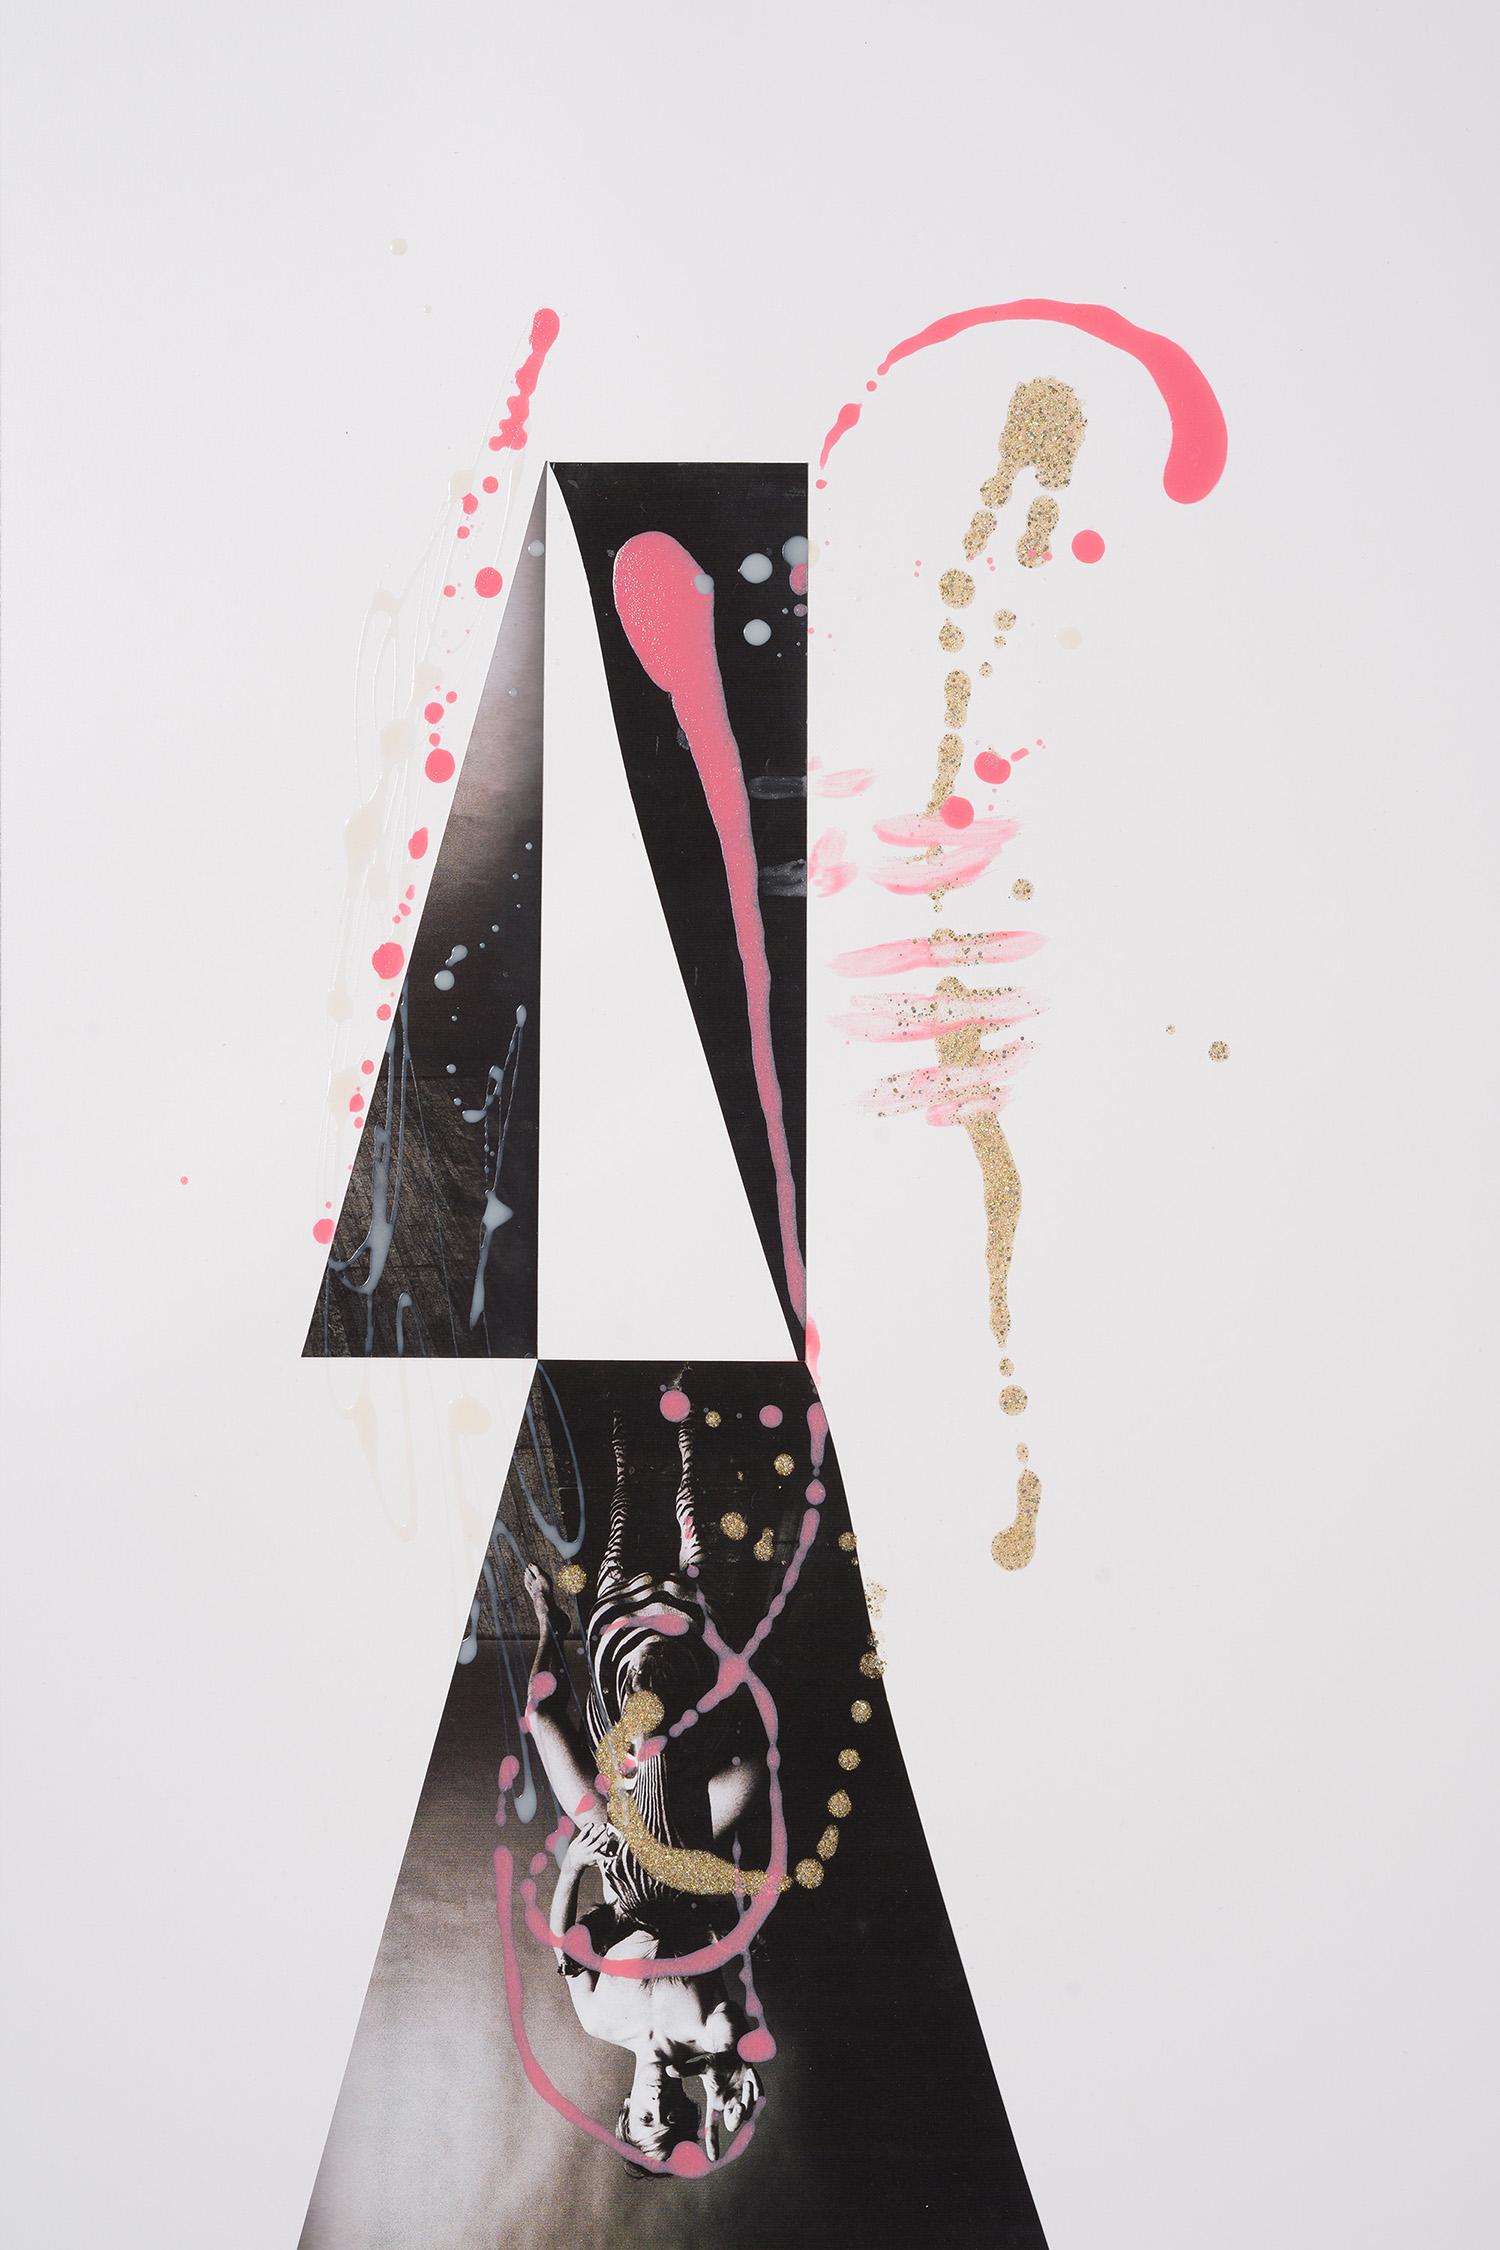 Markues  Eternal Optimist, 2014  mixed media on paper  60 x 40 cm